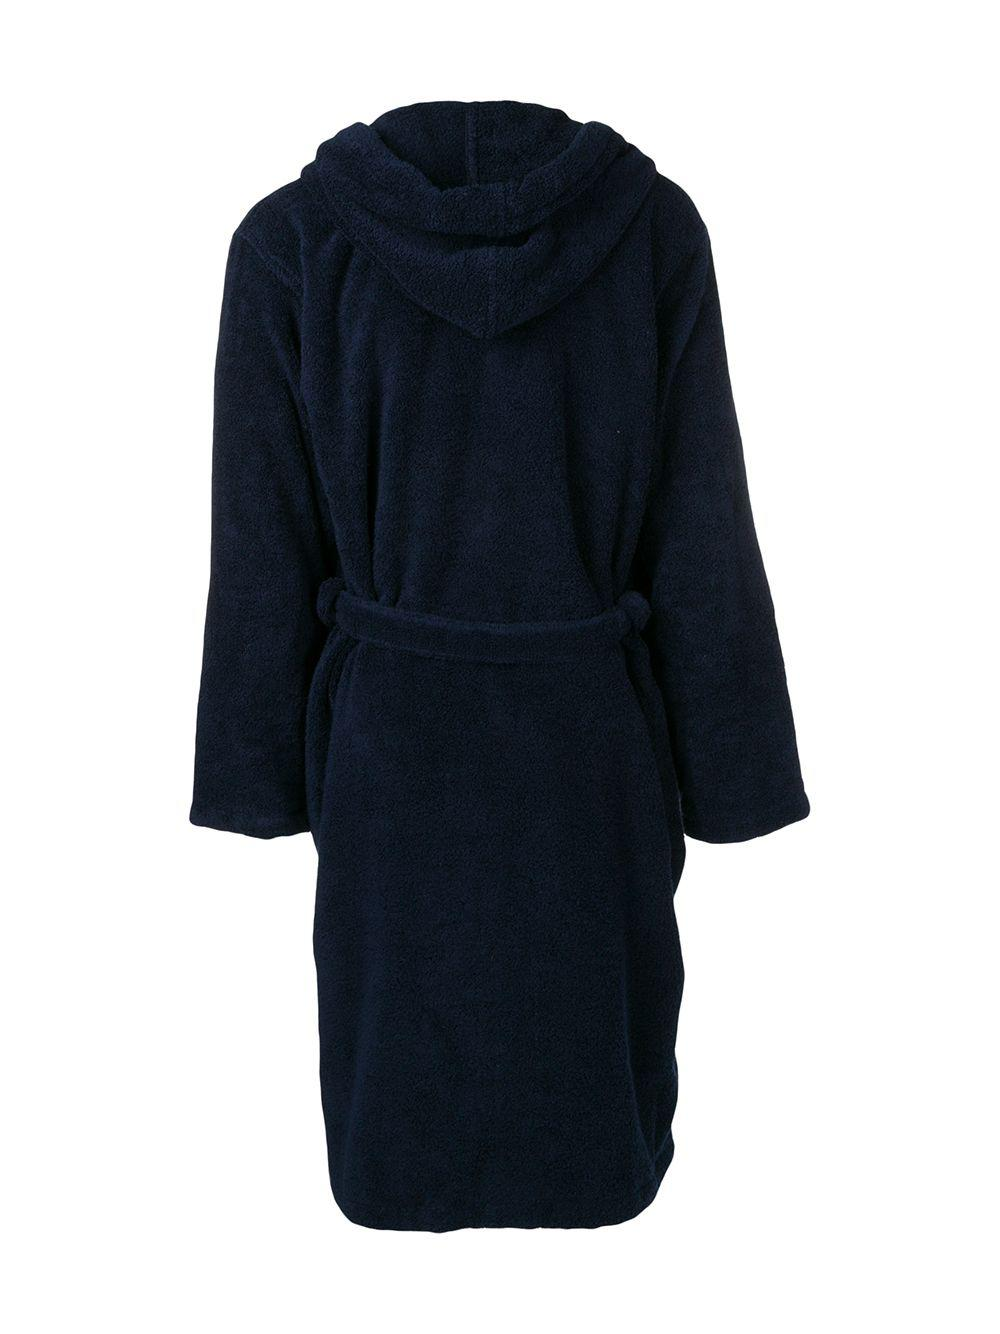 ... Logo Embroidered Toweling Robe for Men - Lyst. View fullscreen 2cd233661